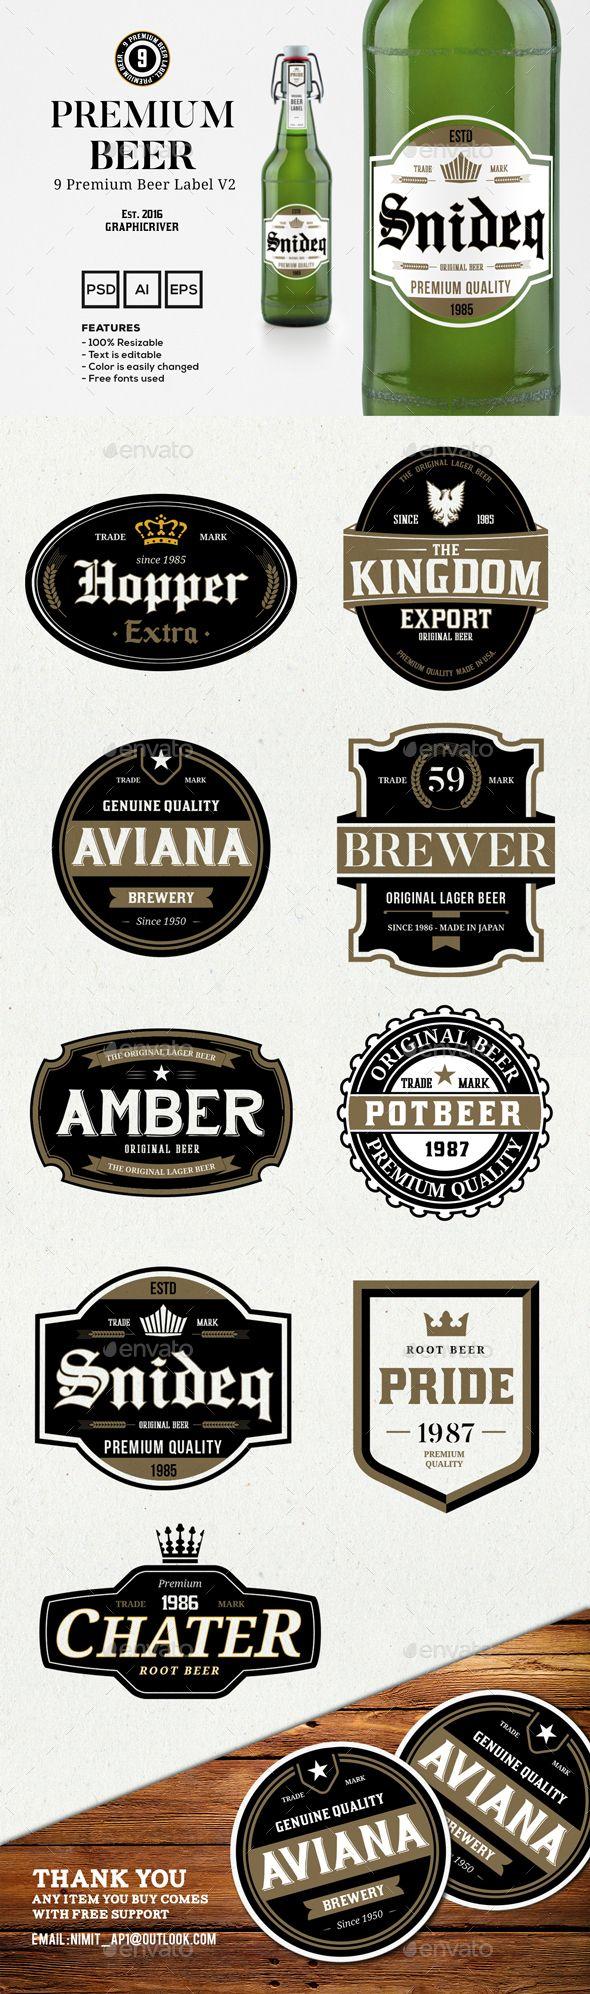 9 Premium Beer Labels V2 — Photoshop PSD #logo #sign • Available here → https://graphicriver.net/item/9-premium-beer-labels-v2/15020080?ref=pxcr